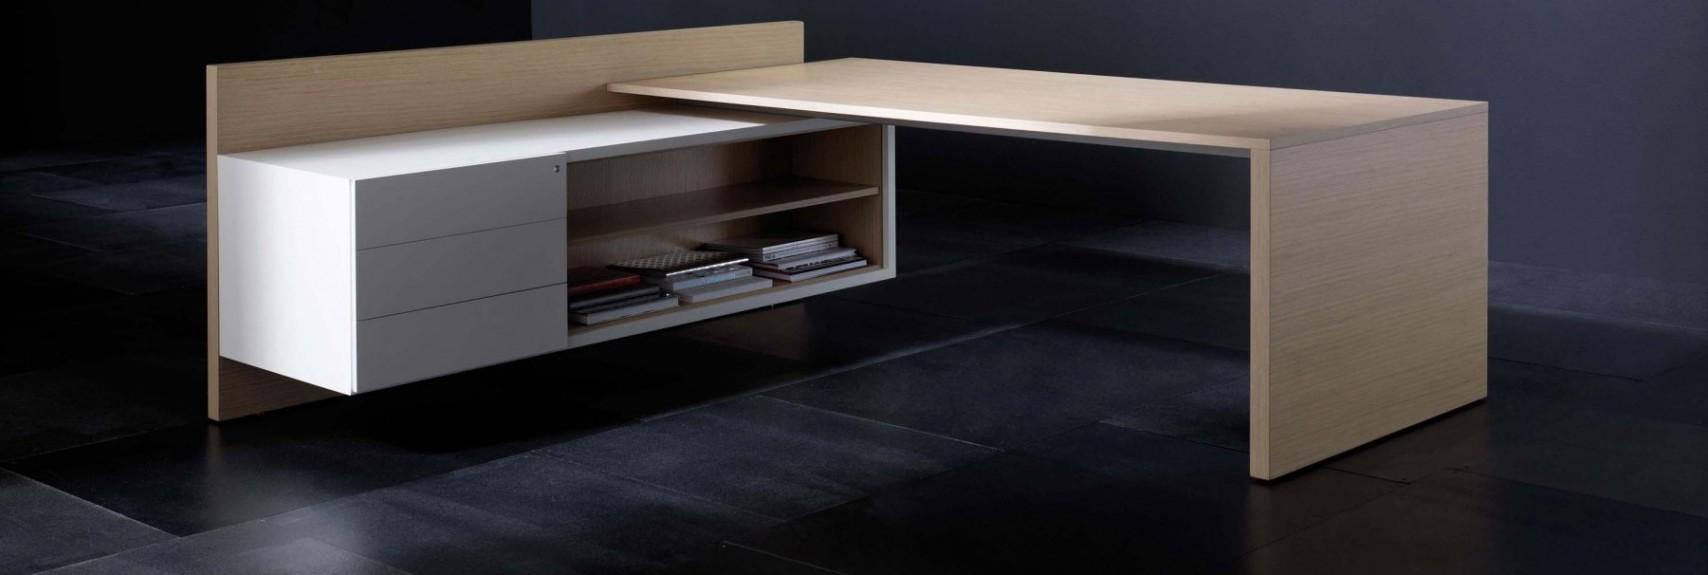 Muebles Directo Gijon - Muebles De Oficina Asturias Idea Creativa Della Casa E Dell [mjhdah]http://mueblesdirecto.com/fichas/imagenes/1.jpg